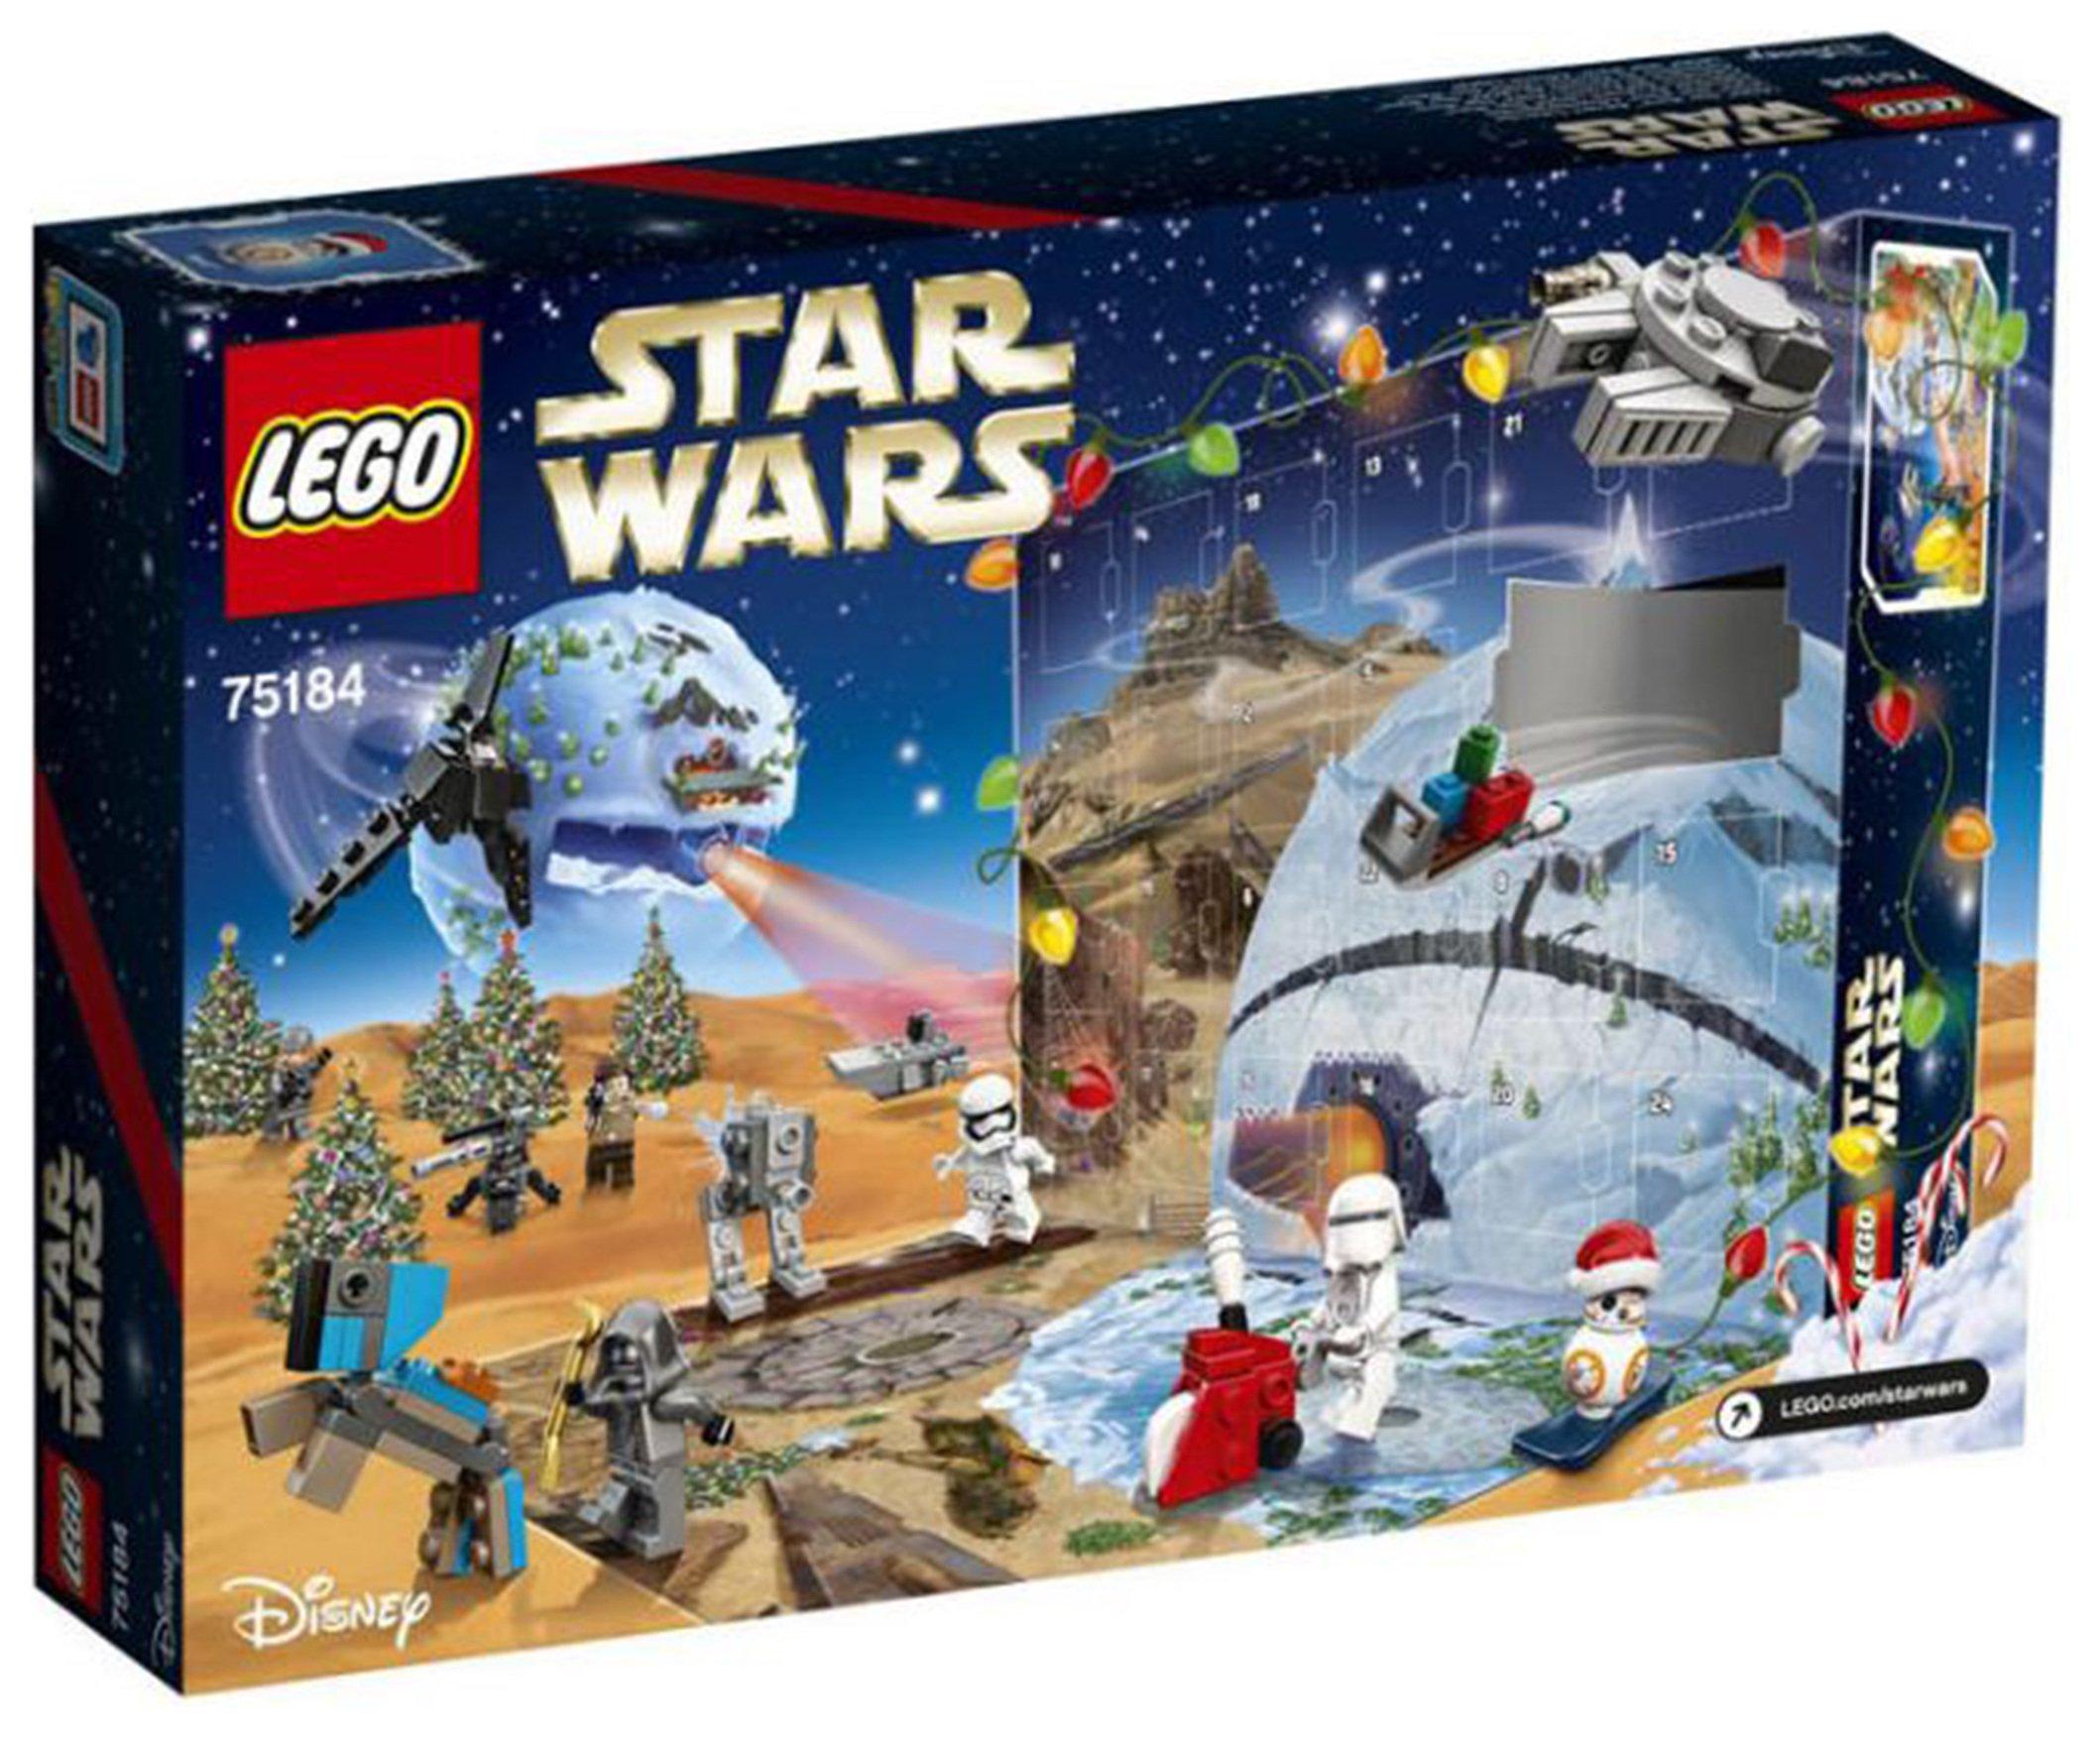 Buy LEGO Star Wars Advent Calendar - 75184 at Argos.co.uk - Your ...